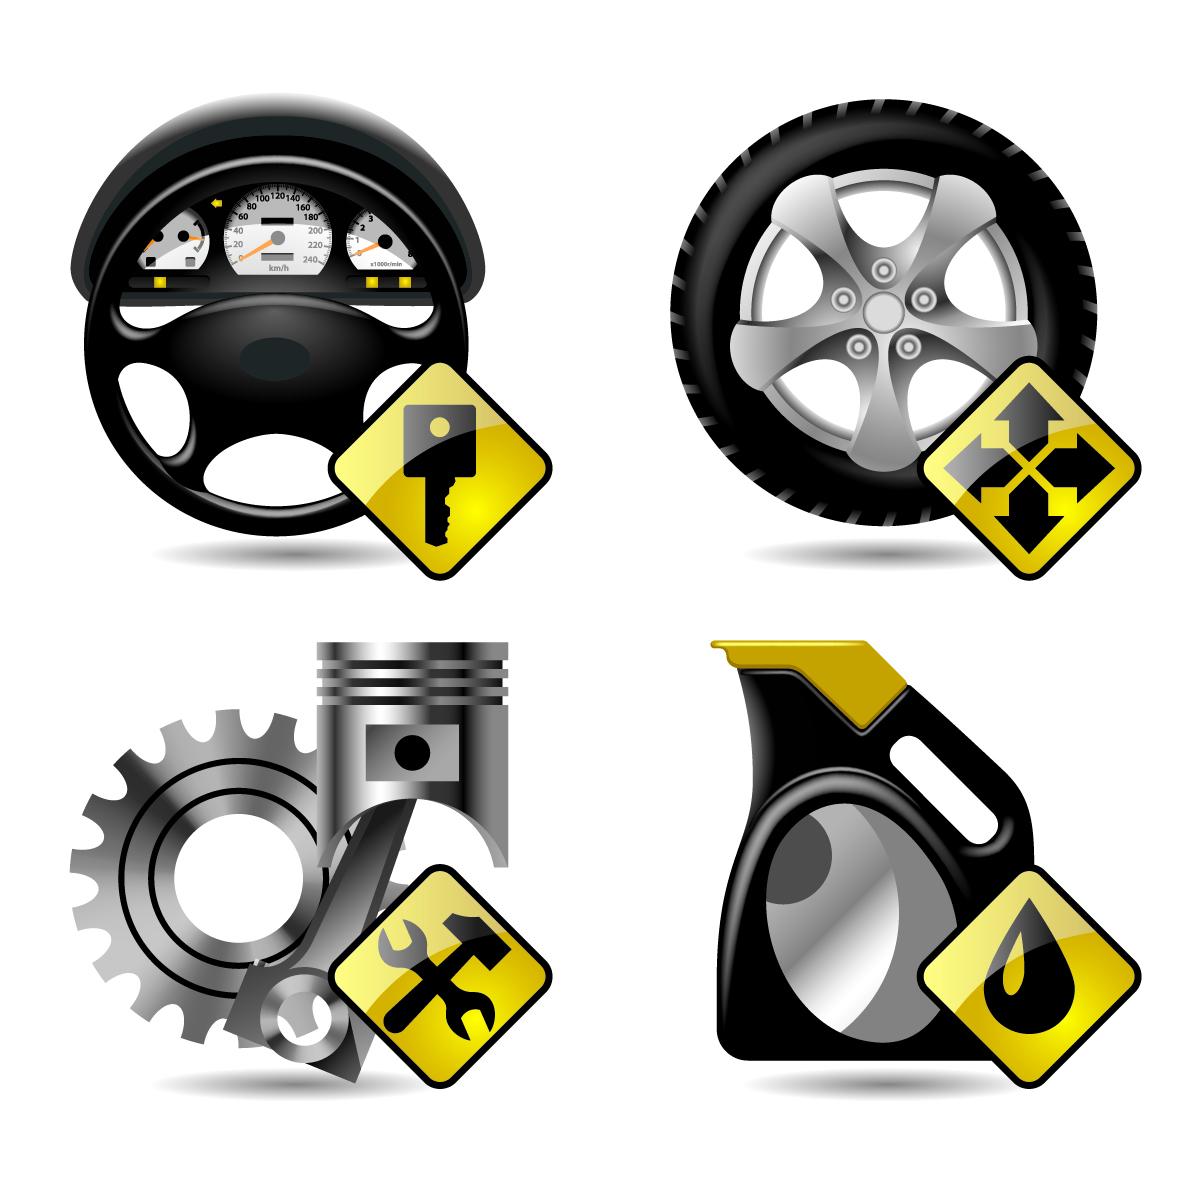 12 Auto Maintenance Icons Images - Car Maintenance Icons ...